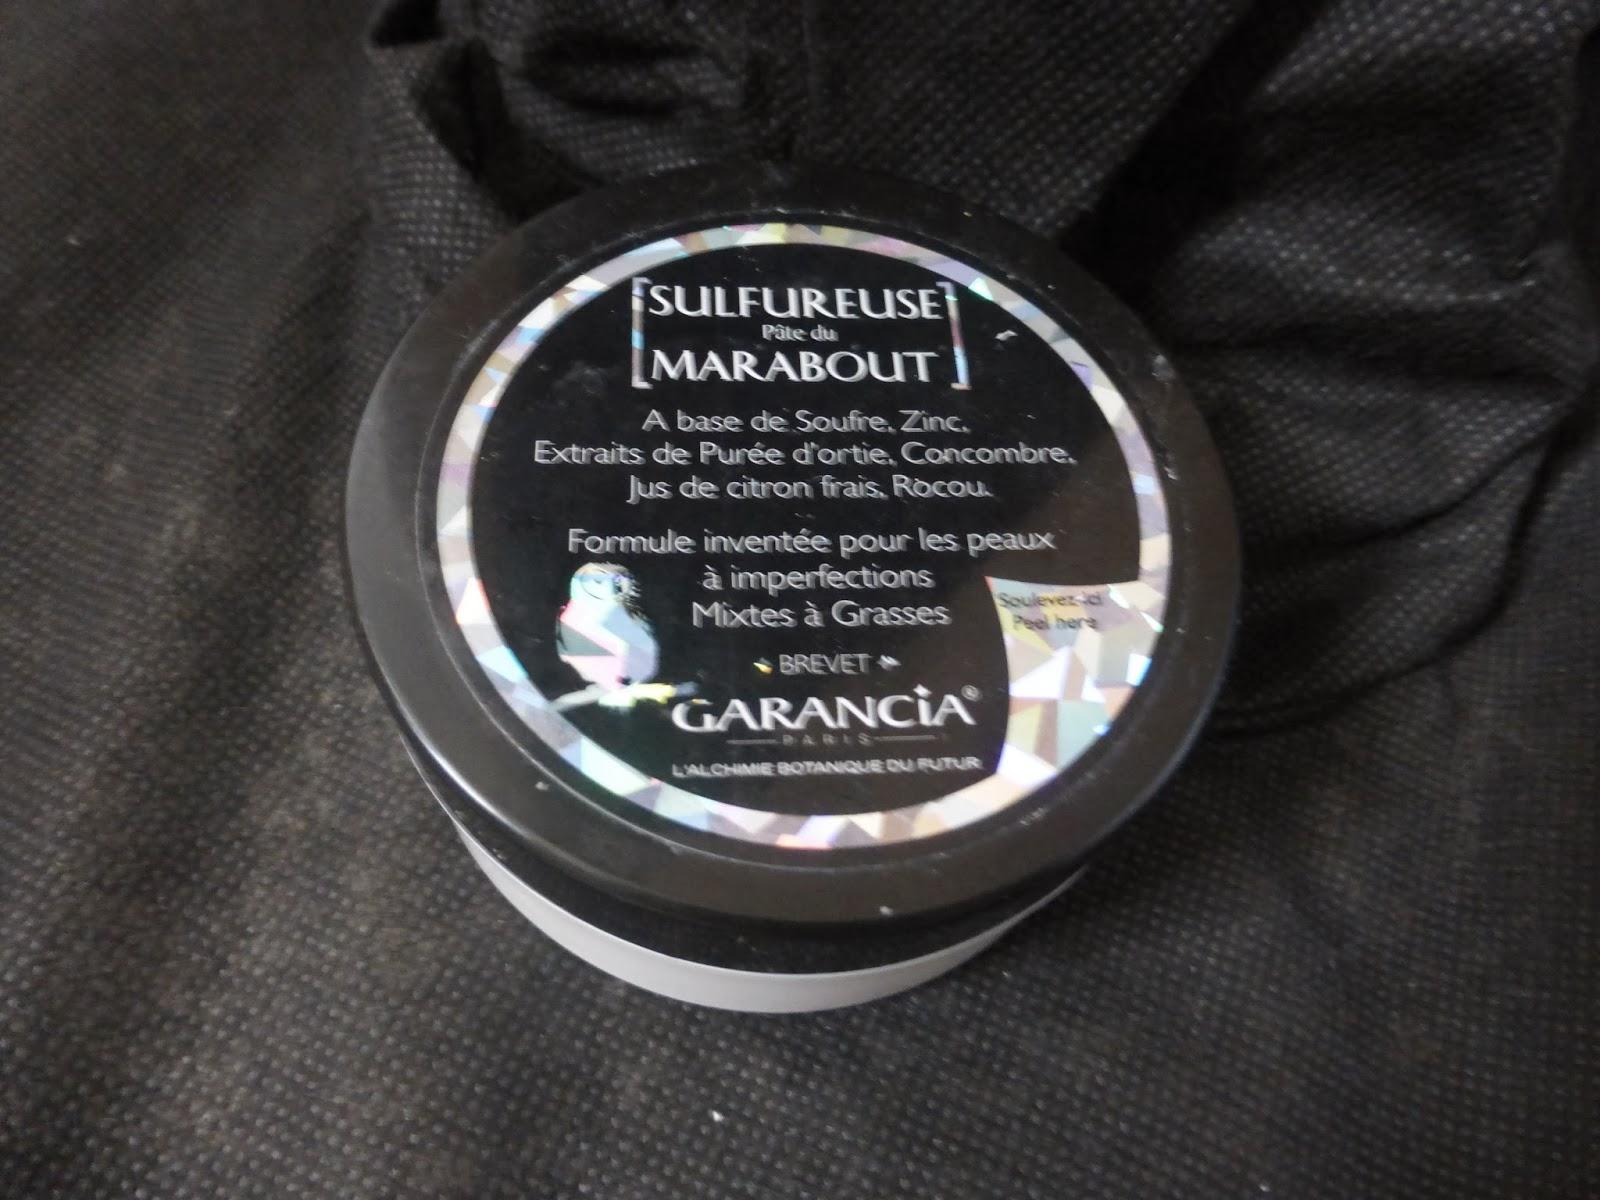 feerie enchantee une peau purifi 233 e et douce la sulfureuse p 226 te du marabout de garancia